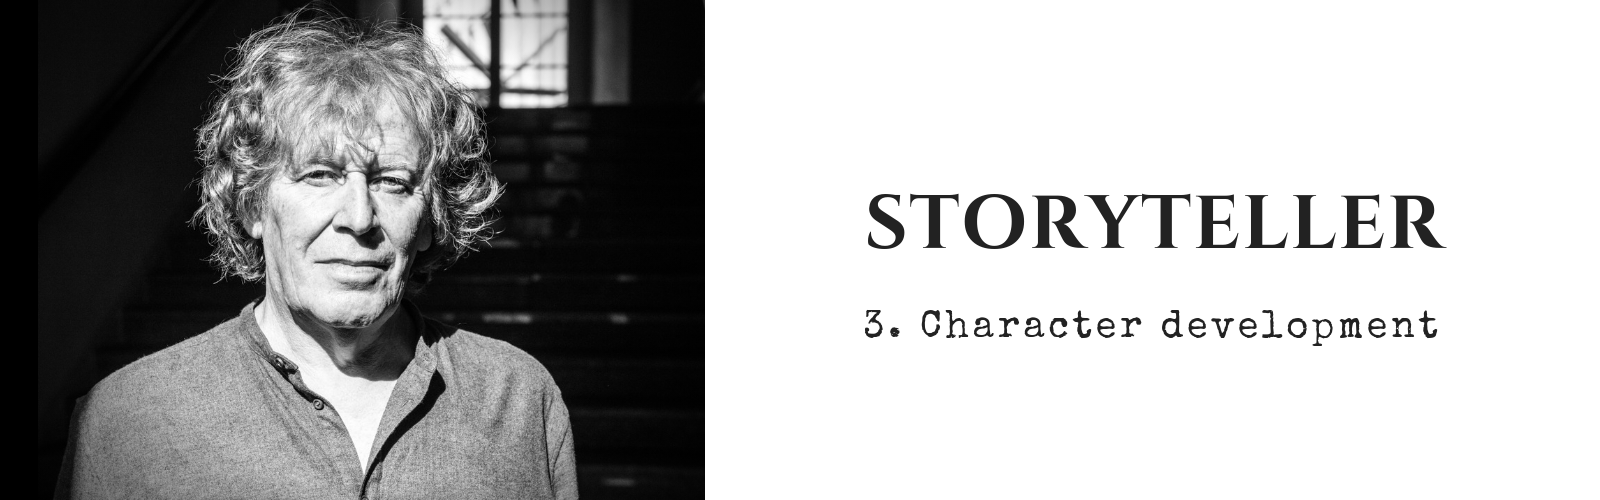 Pat Mills by Richard Klicnik header image STORYTELLER 3 Character development